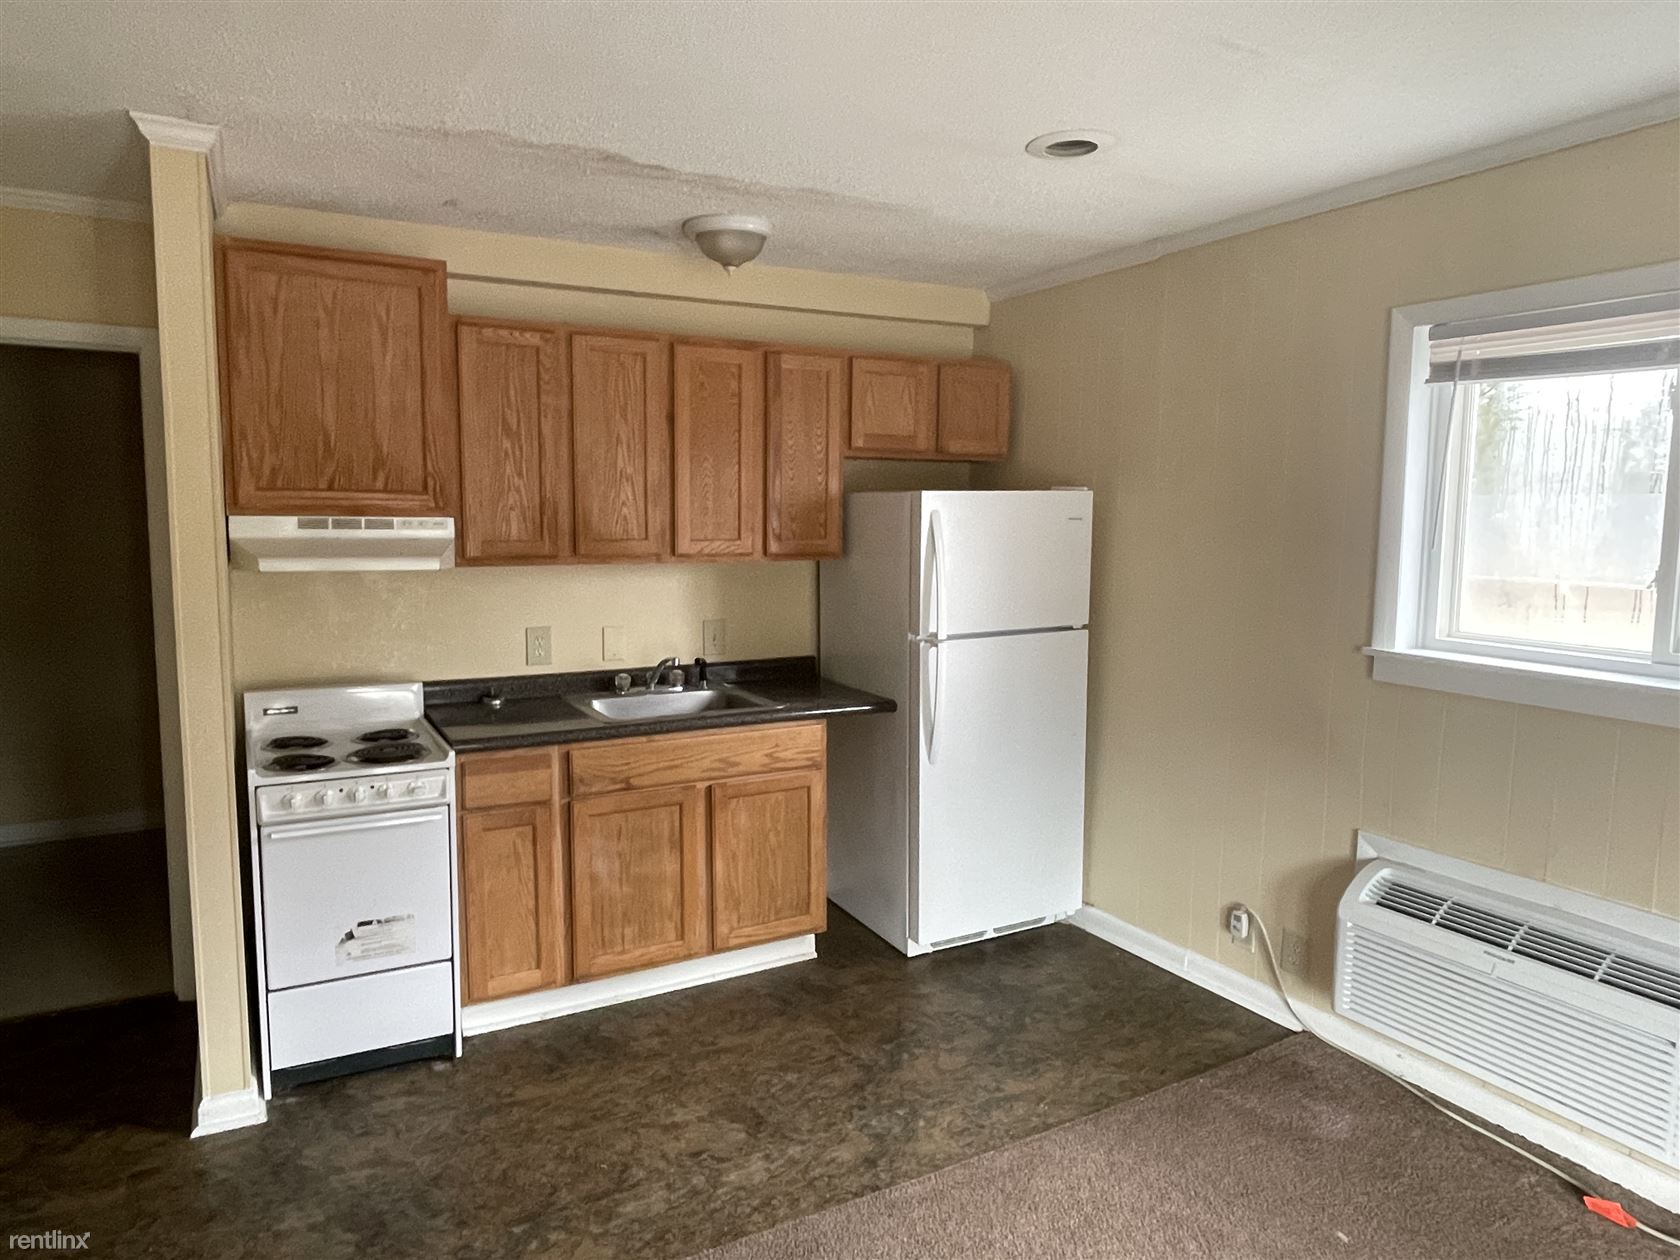 2003 House Ave Apt 3, Durham, NC - $725 USD/ month